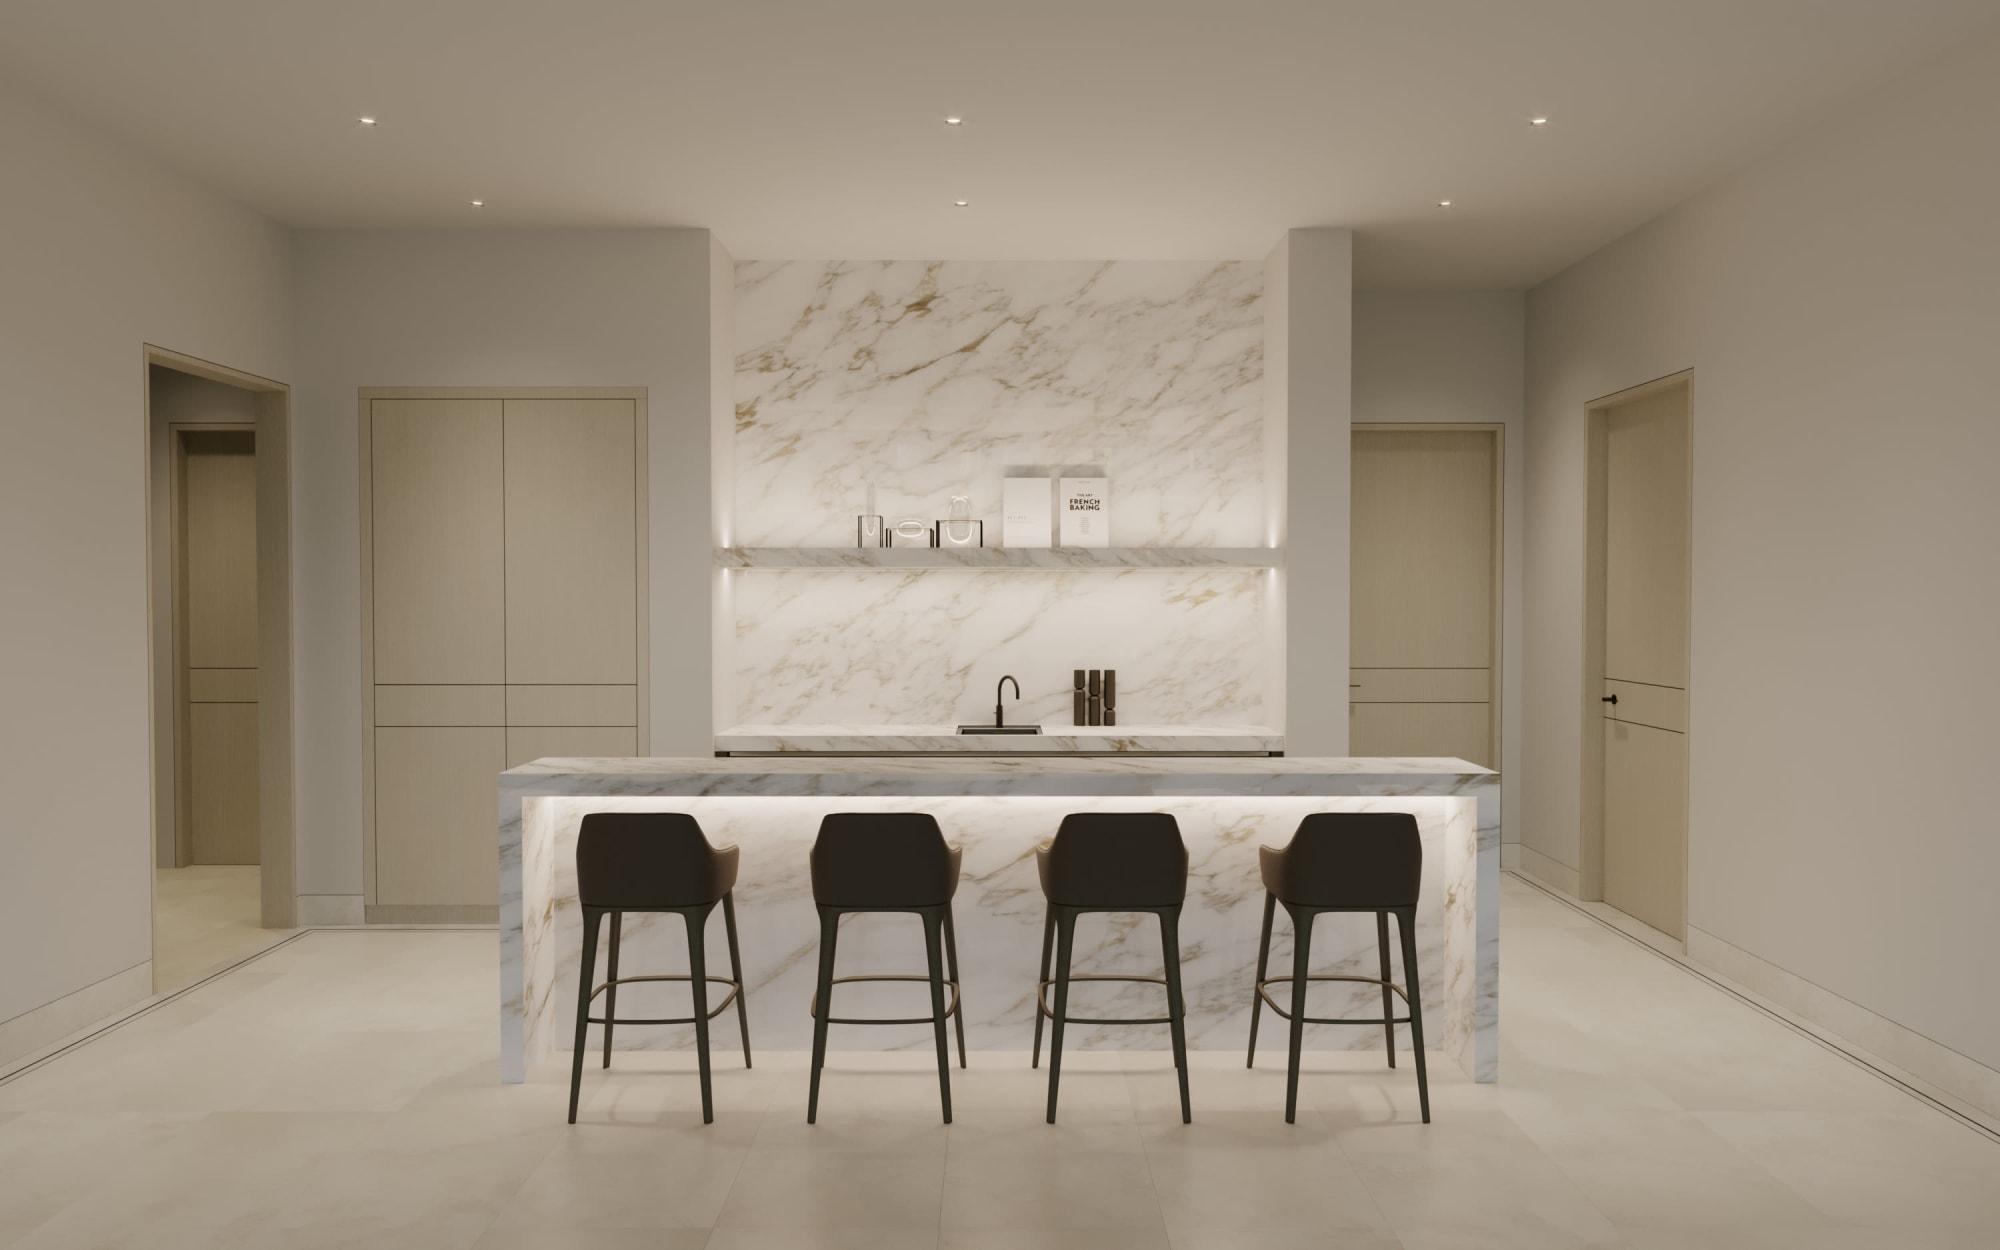 Interior Design by Alix Lawson seen at Dubai Hills - Emaar, دبي - Dubai Hills